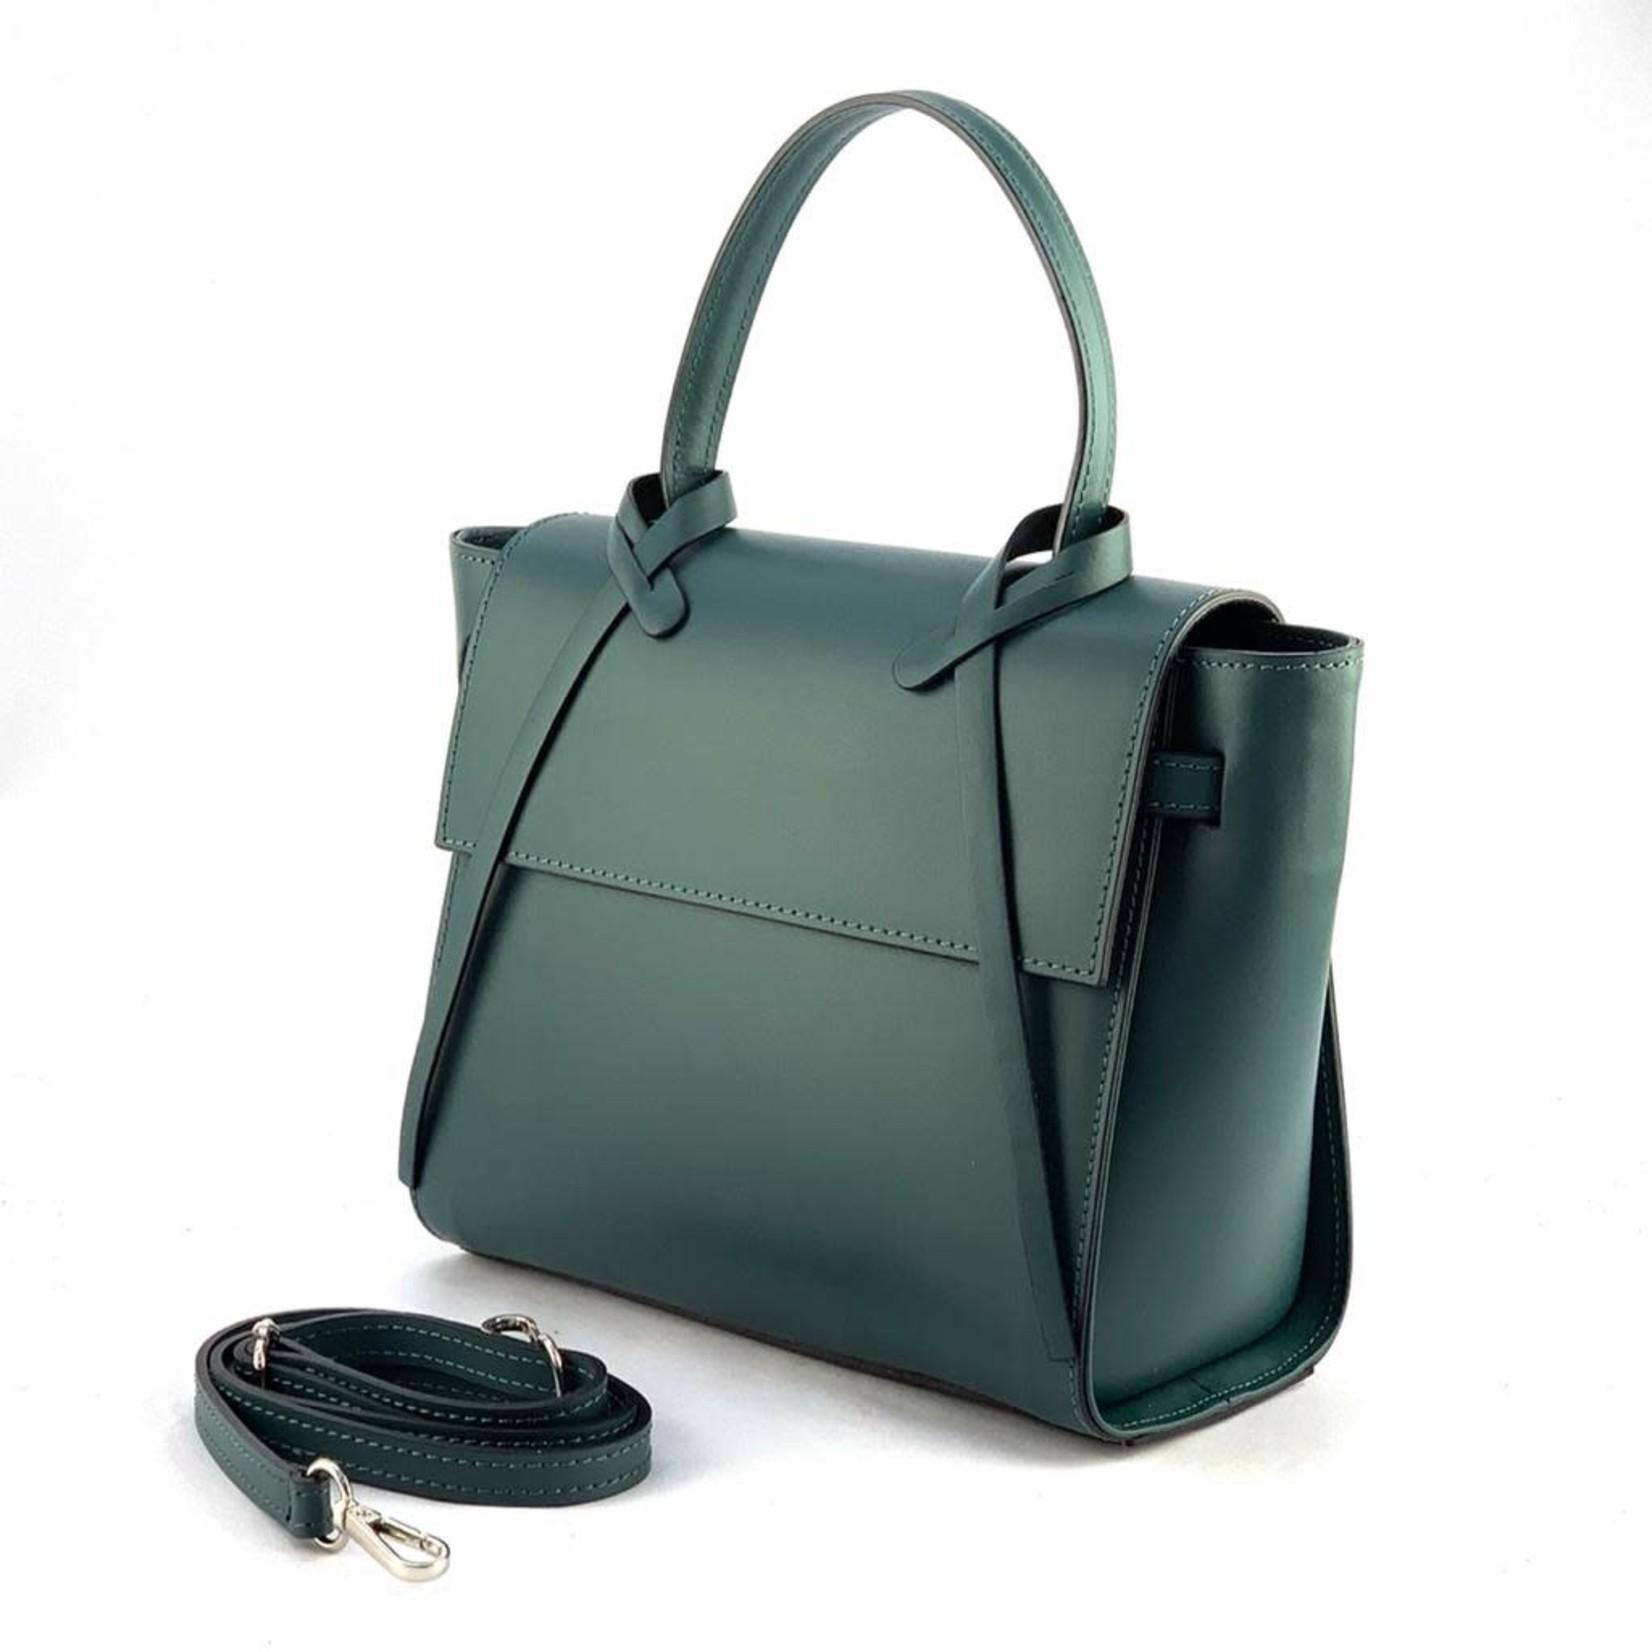 Marlon Chique the green bag